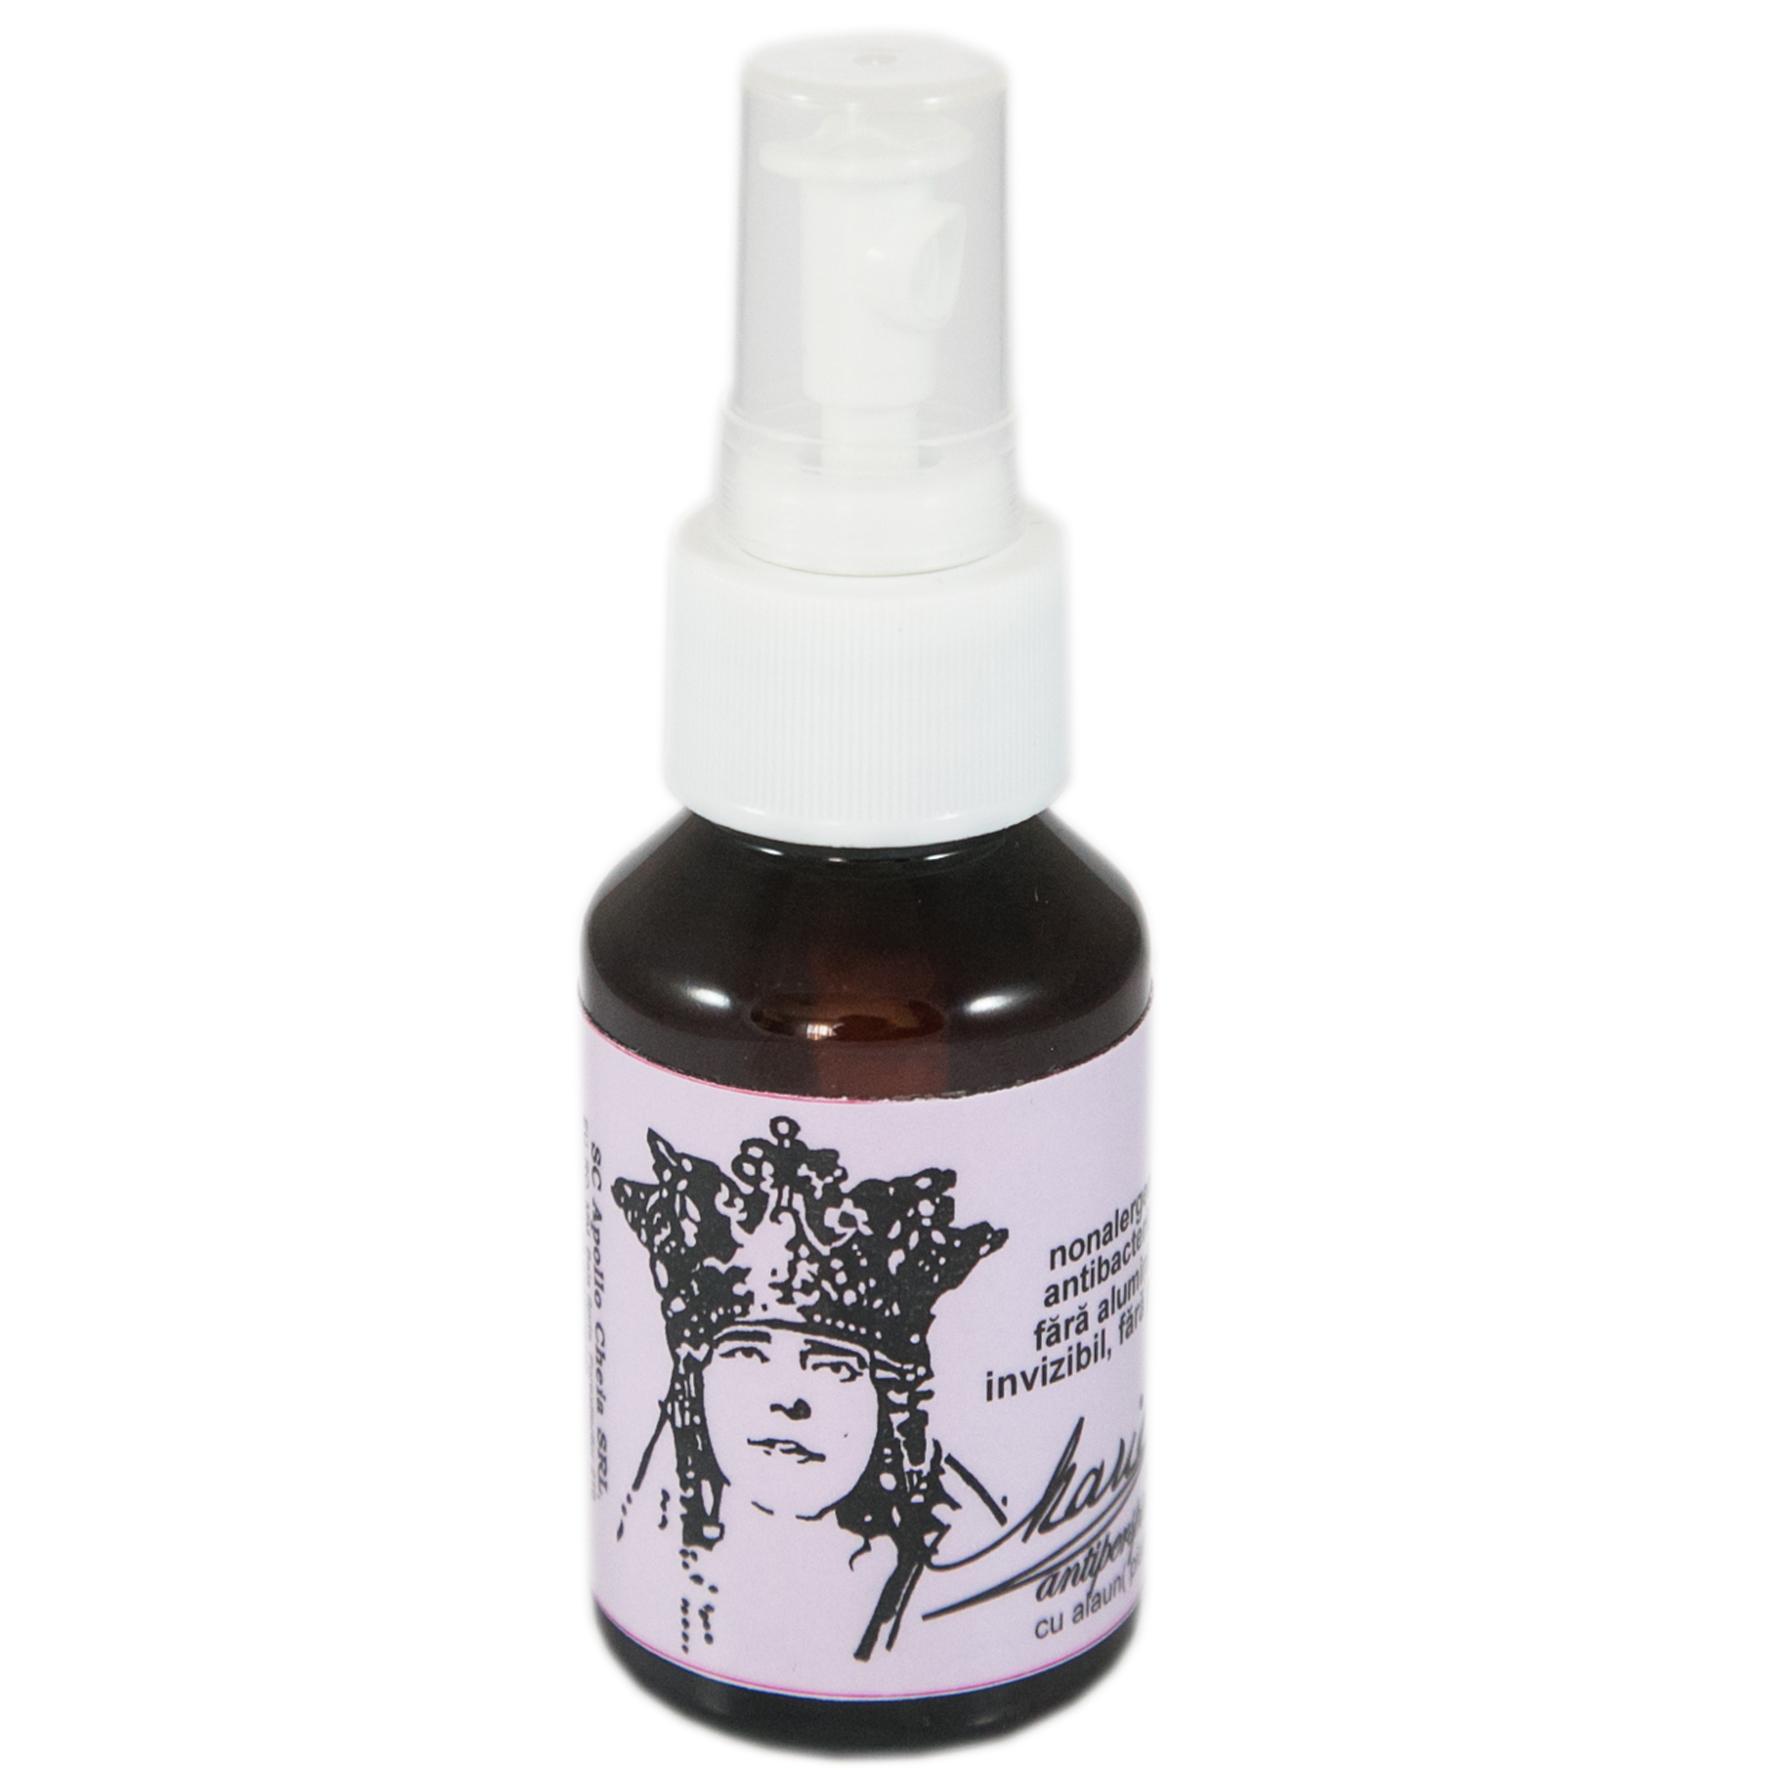 Maria spray antiperspirant natural